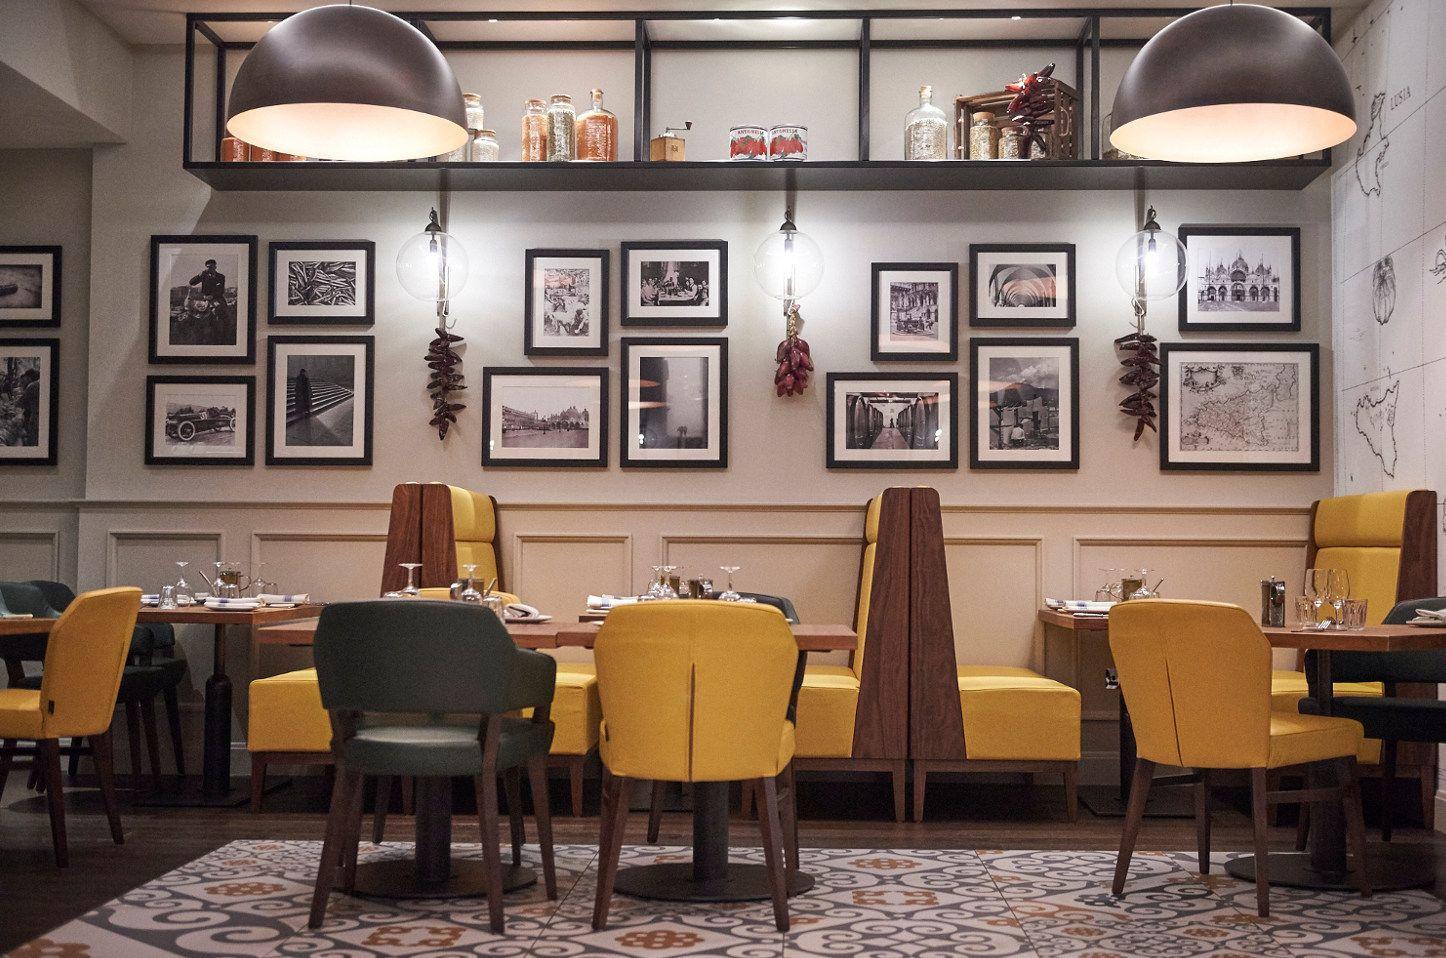 mercante-restaurant-sheraton-grand-park-lane-hotel-4